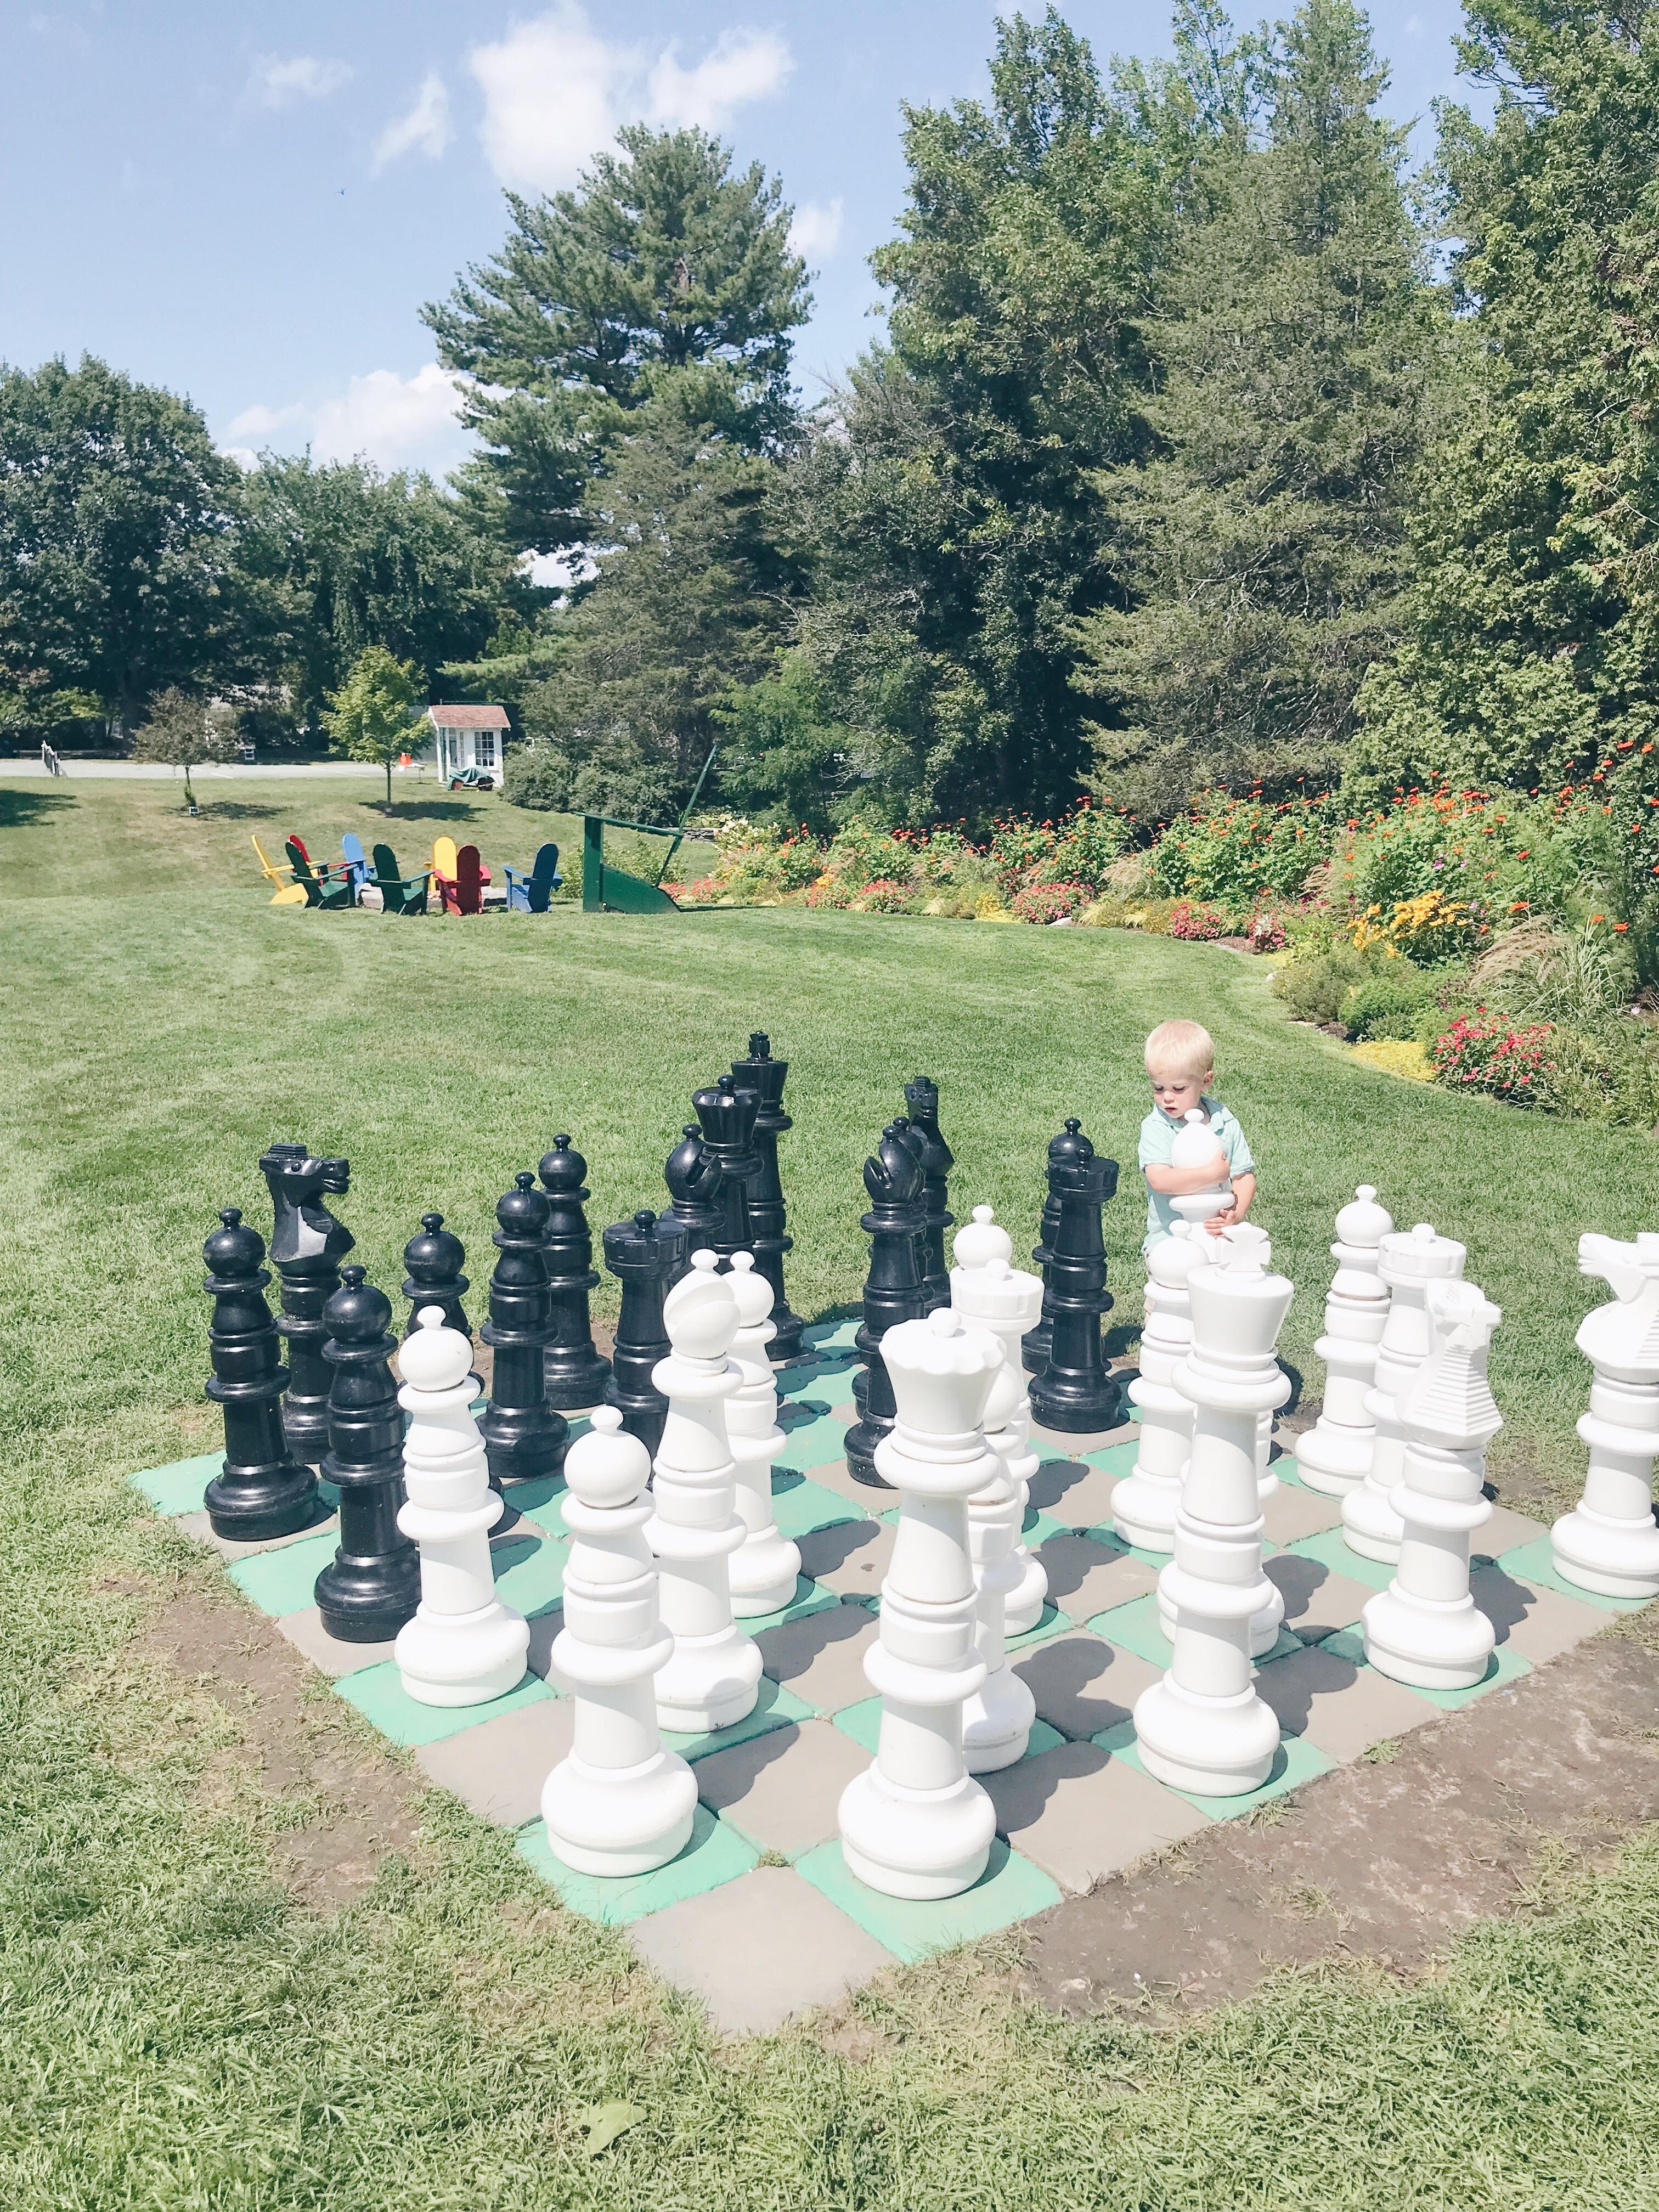 Basin Harbor Resort Review - Oversized Outdoor Chess